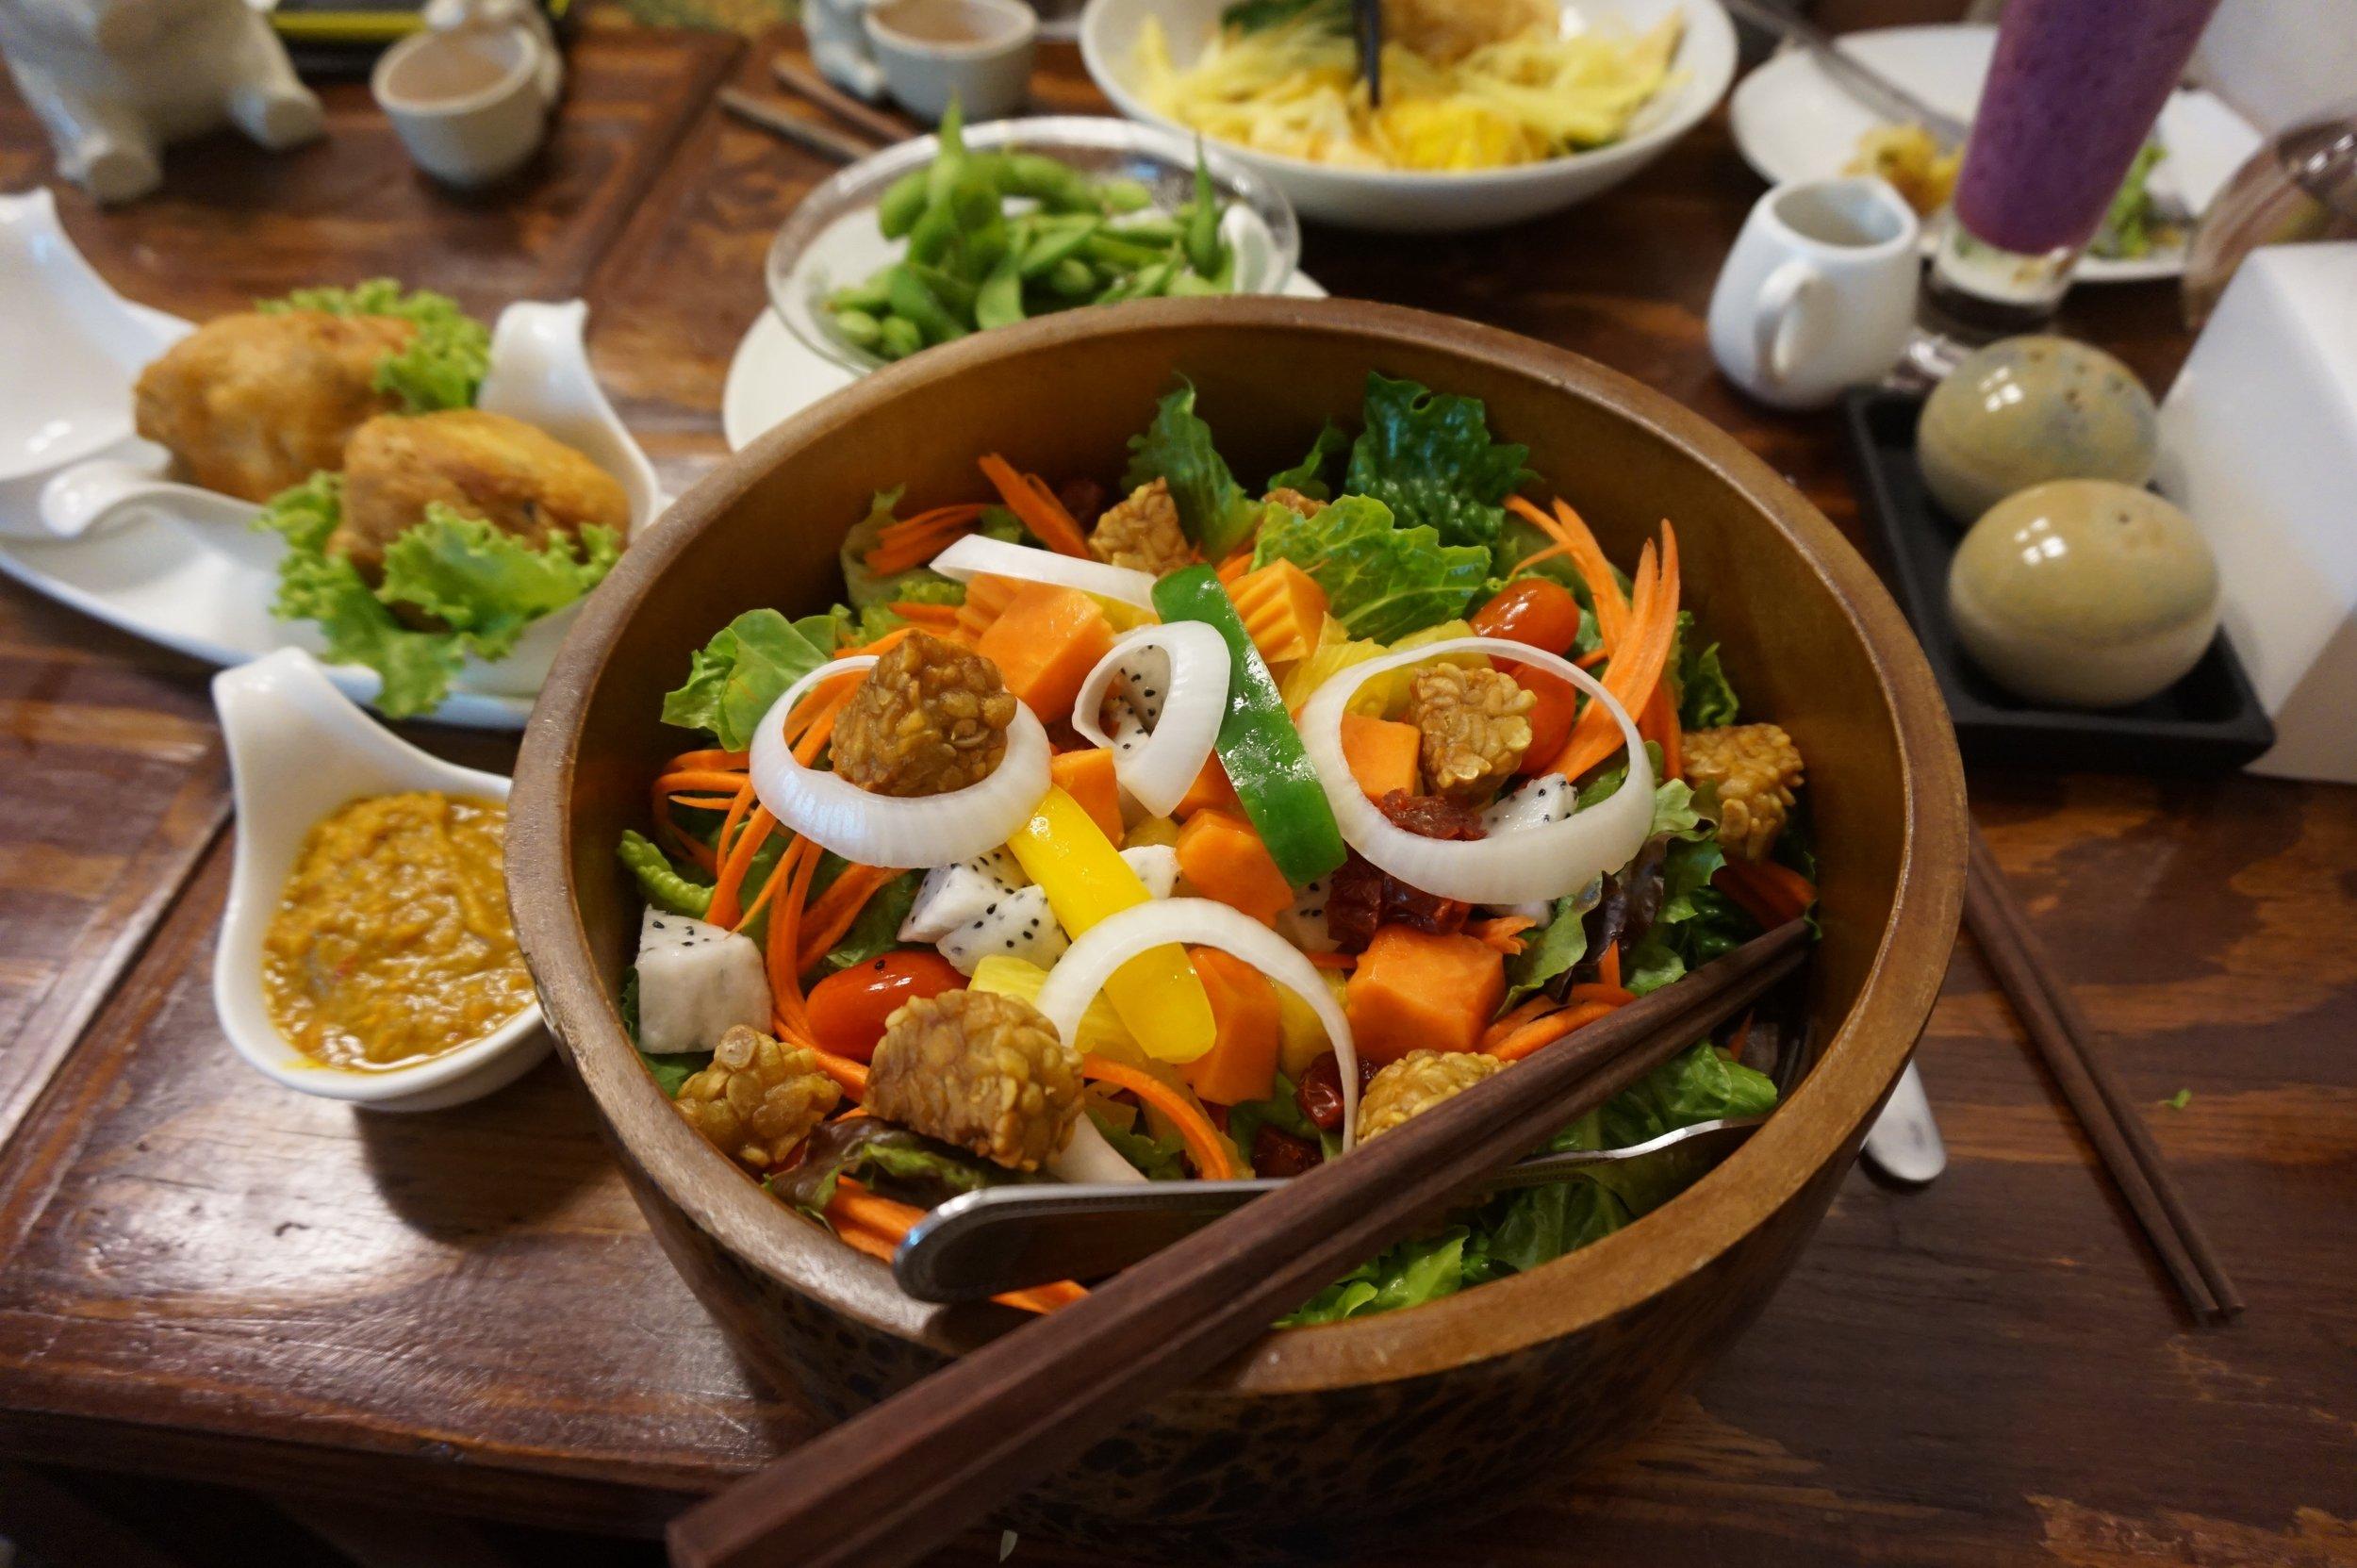 sweet-restaurant-asian-dish-meal-food-1040918-pxhere.com.jpg